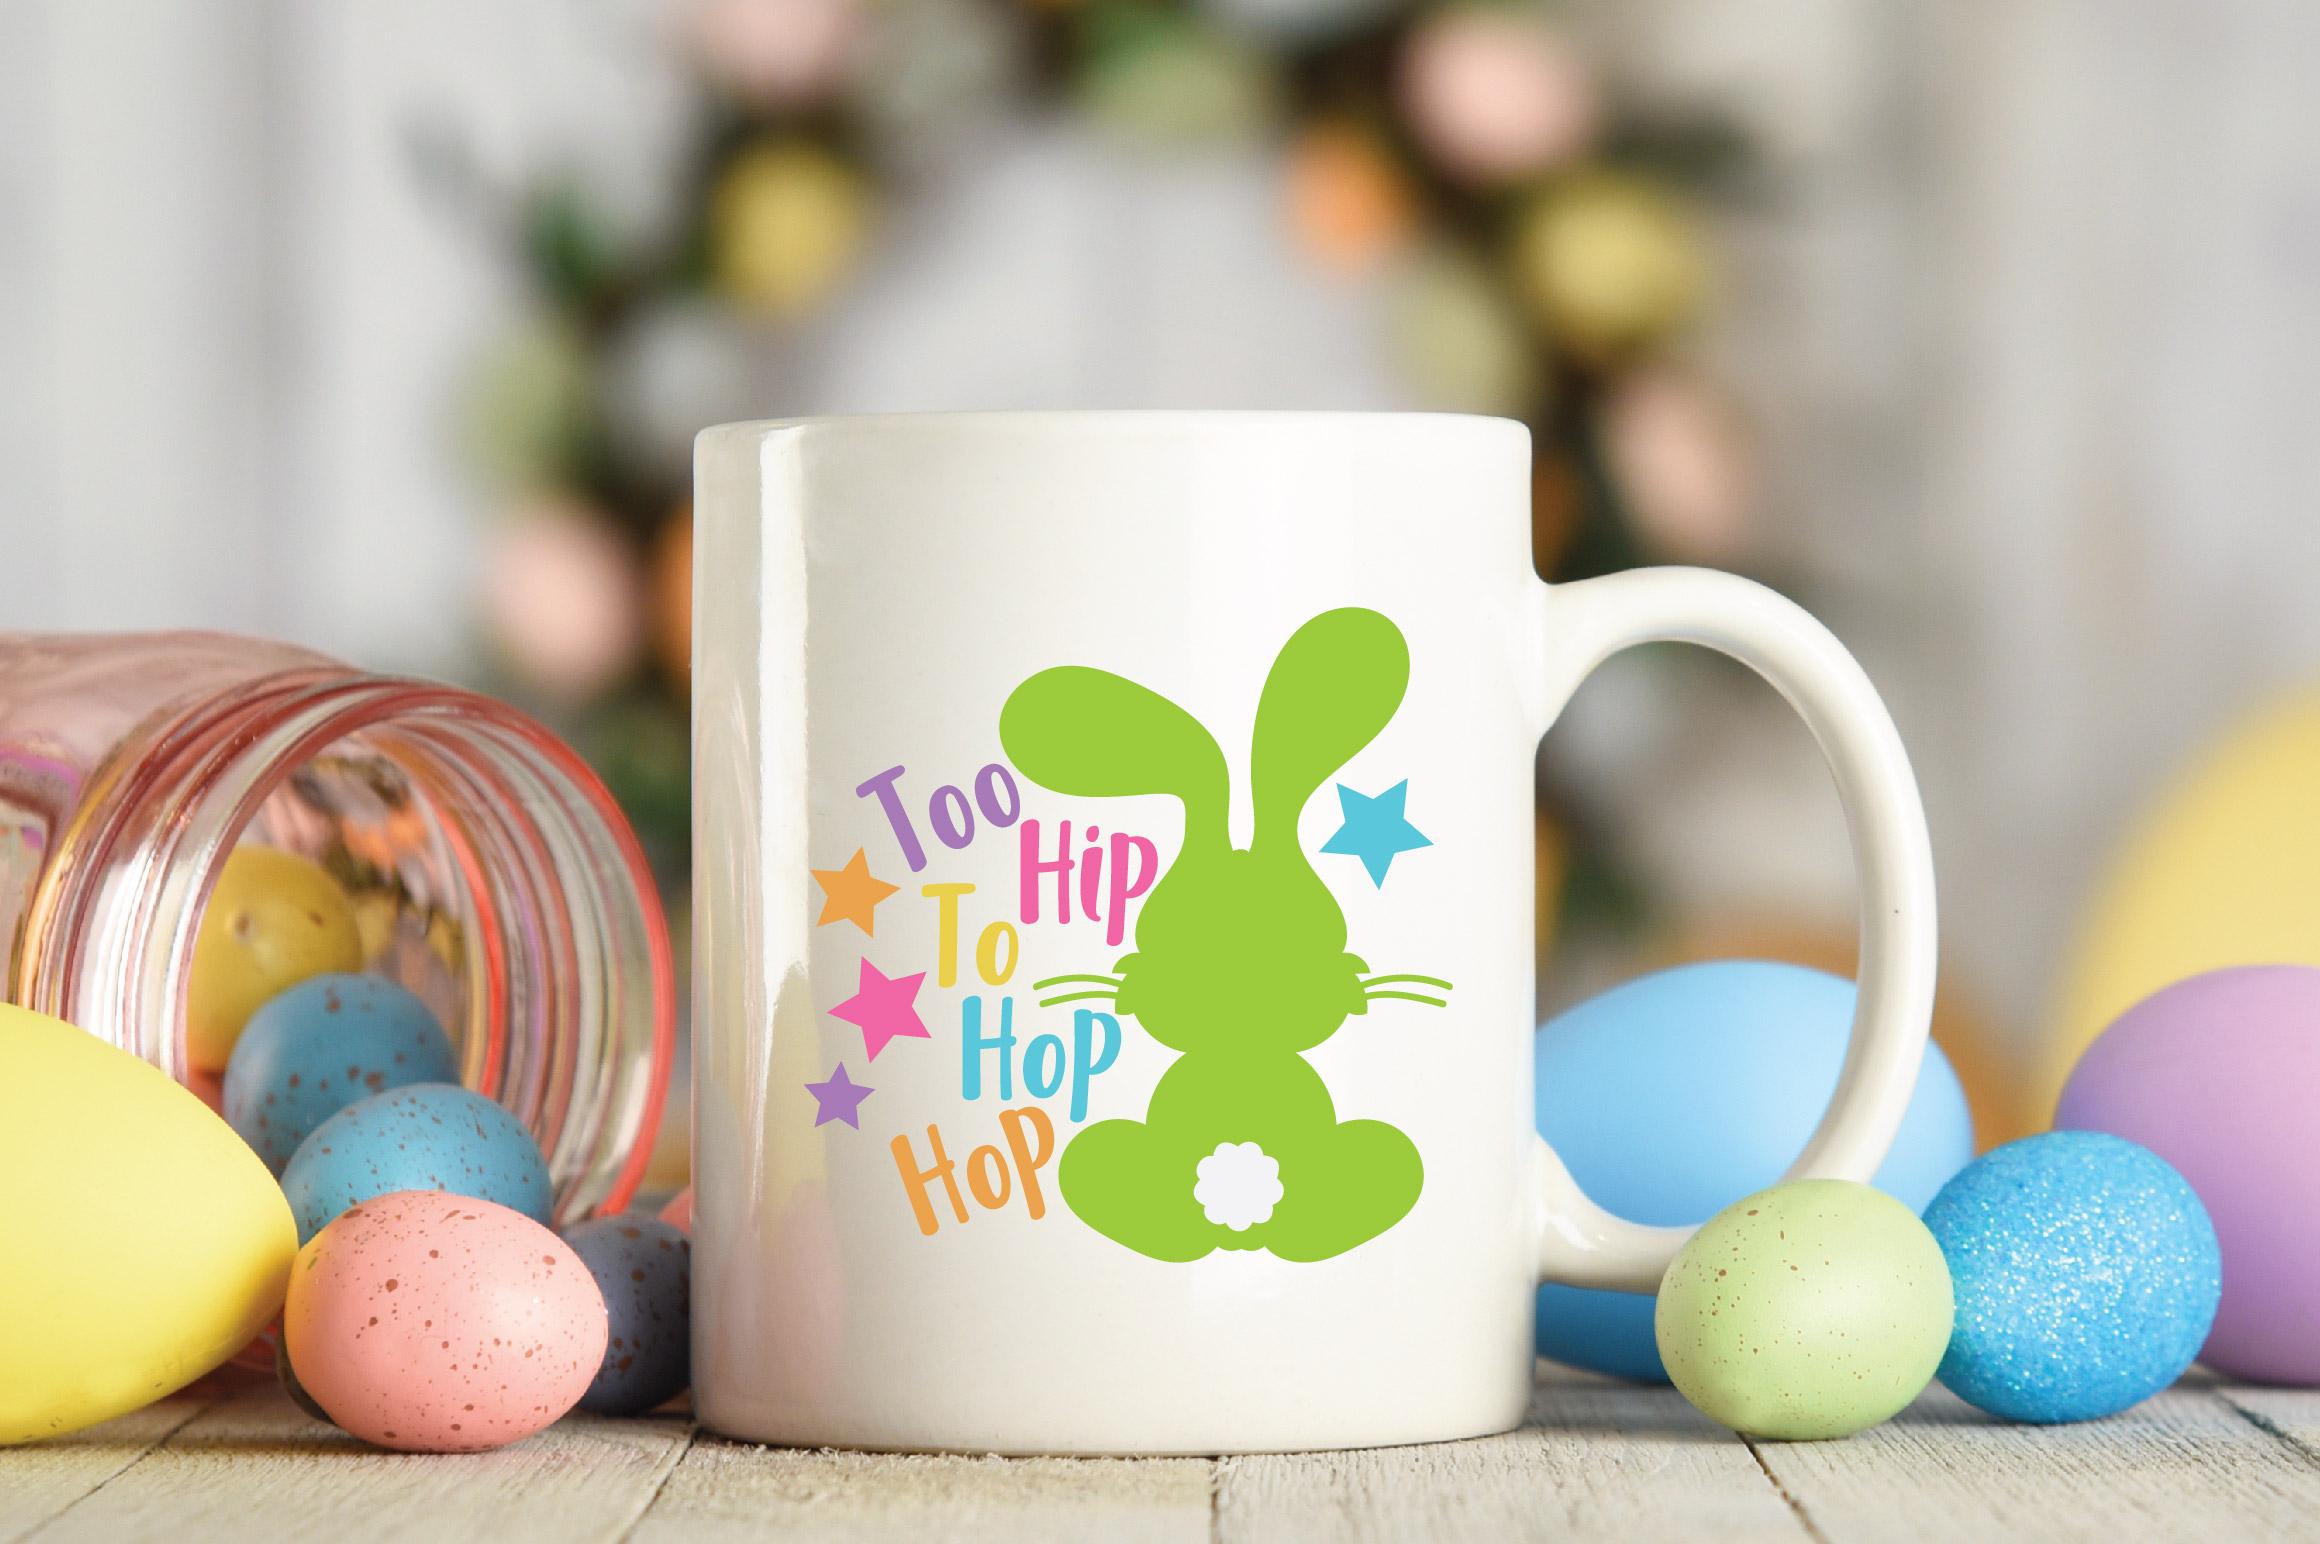 Easter SVG Cut File - Too Hip to Hop Hop SVG DXF EPS PNG JPG example image 4